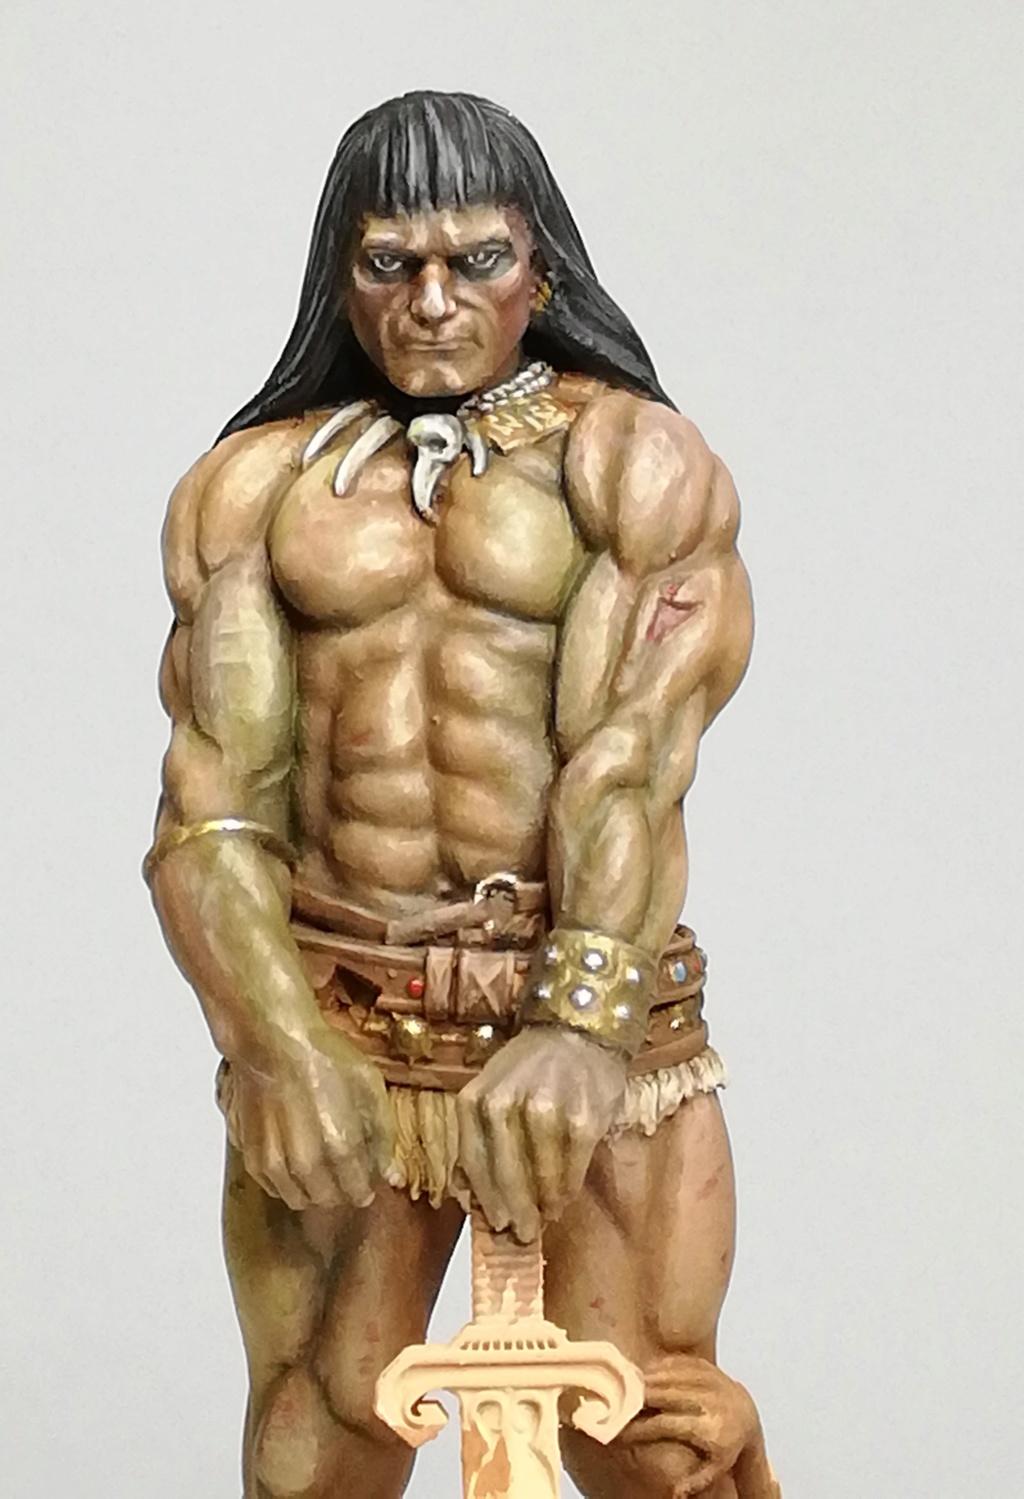 Conan, d'après Frazetta - Terminé Conan_27